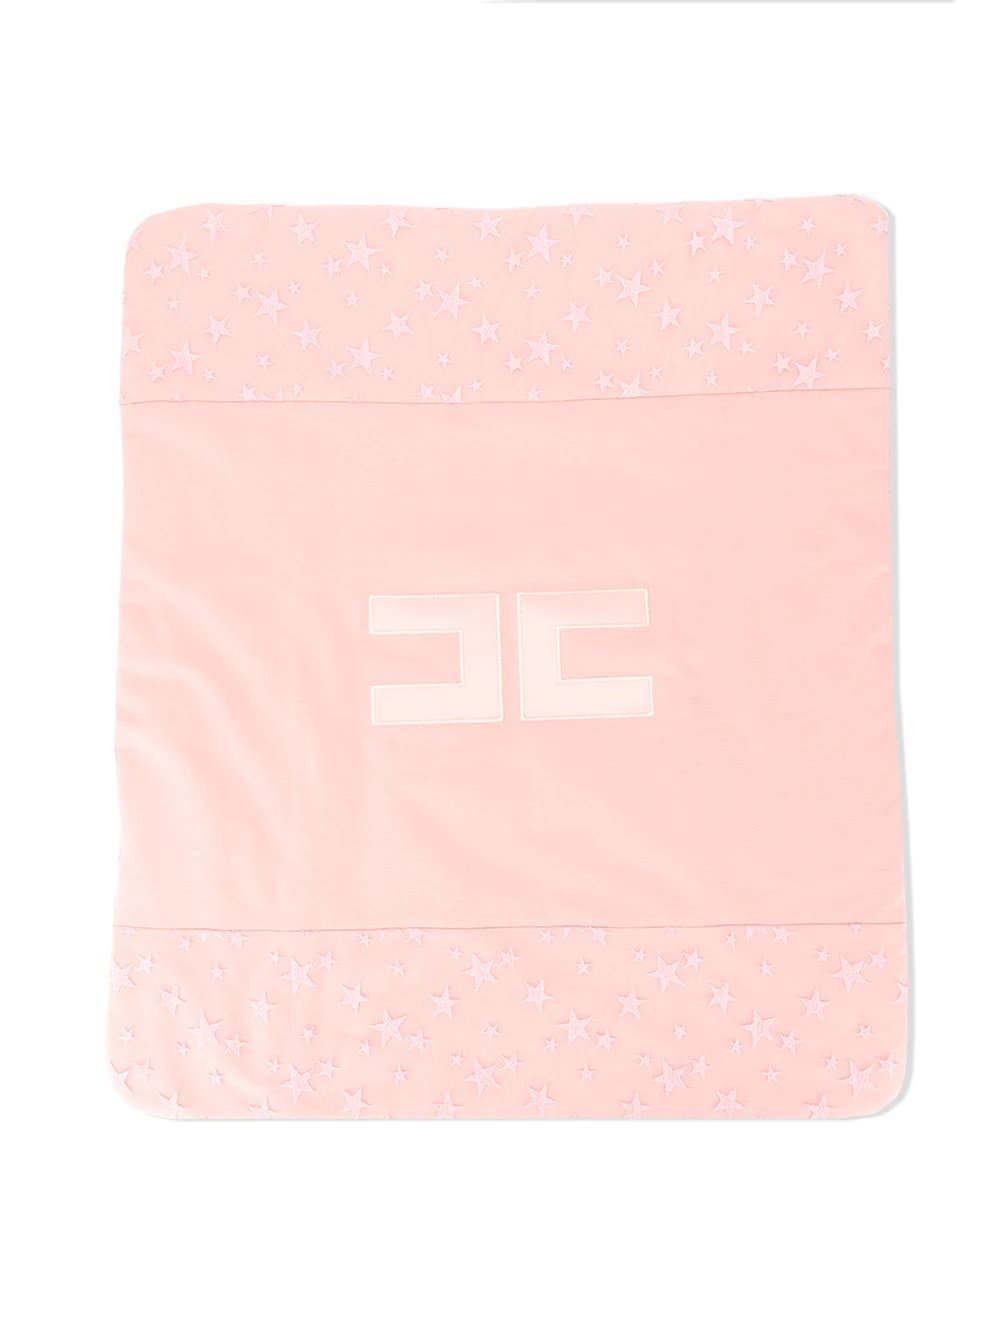 Elisabetta Franchi | Elisabetta Franchi La Mia Bambina одеяло с логотипом | Clouty